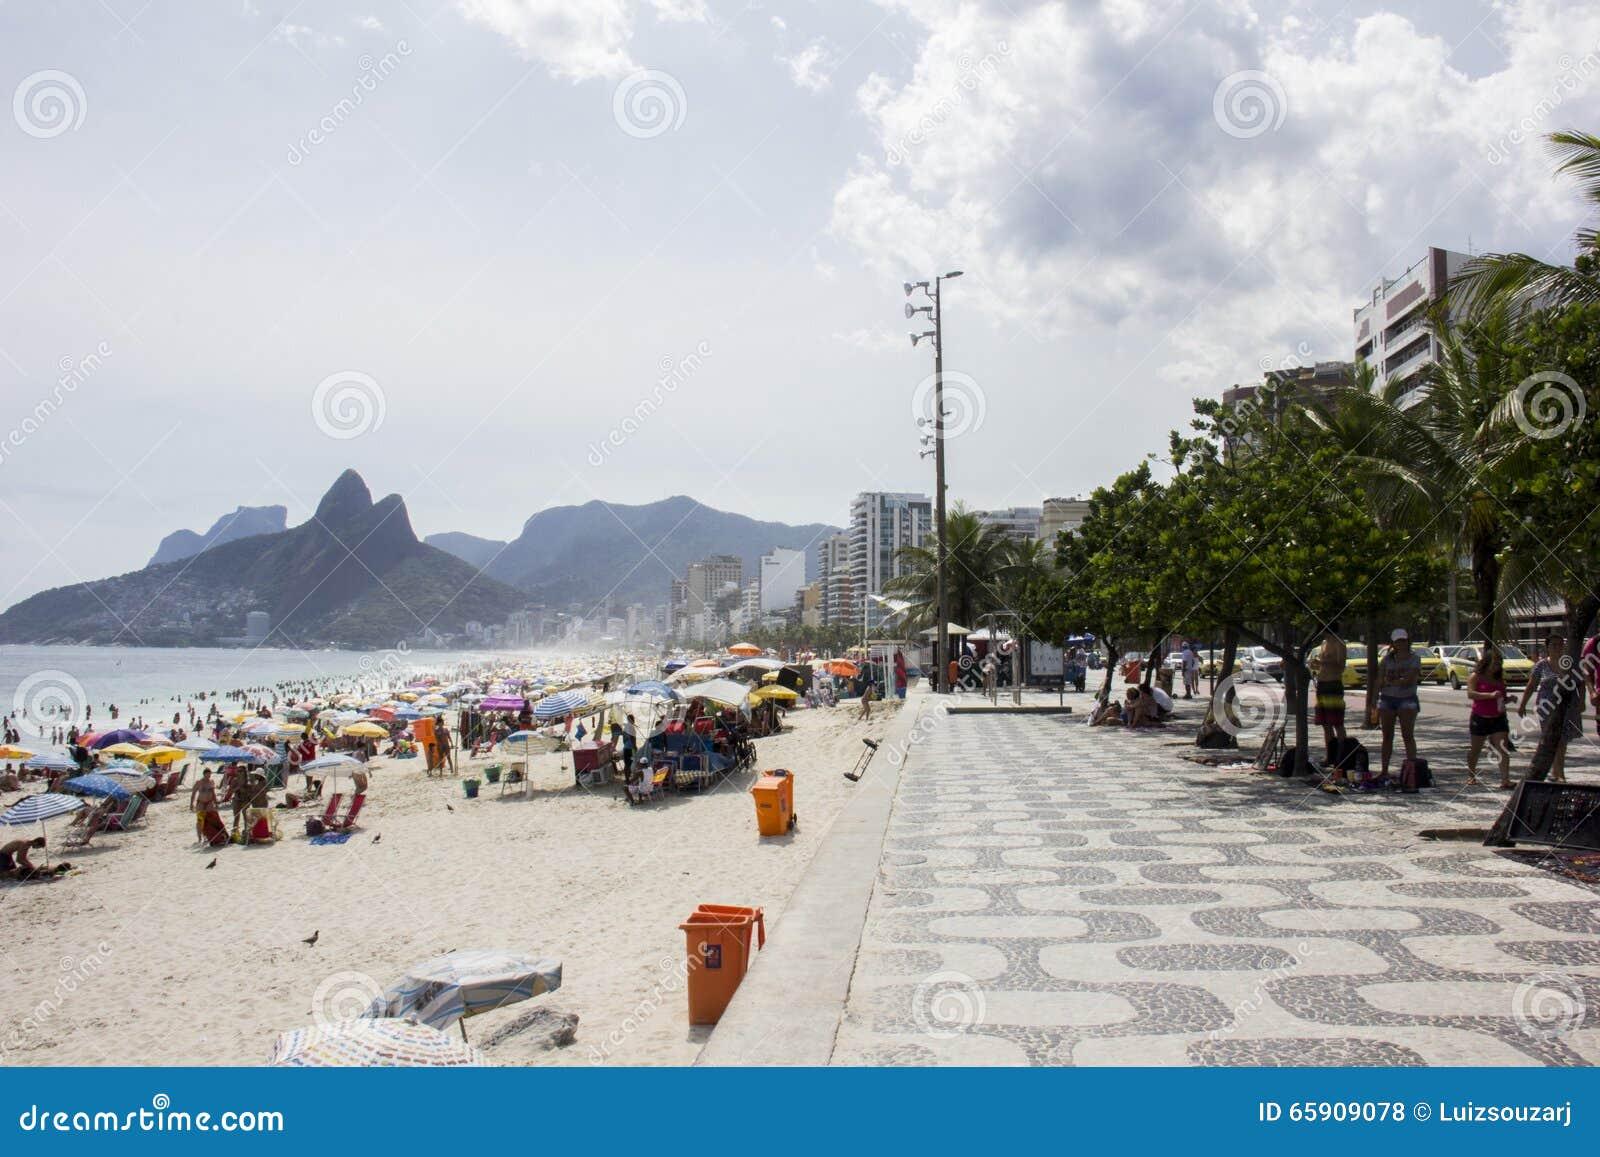 Rio Carnival aglomerou praias e dias ensolarados